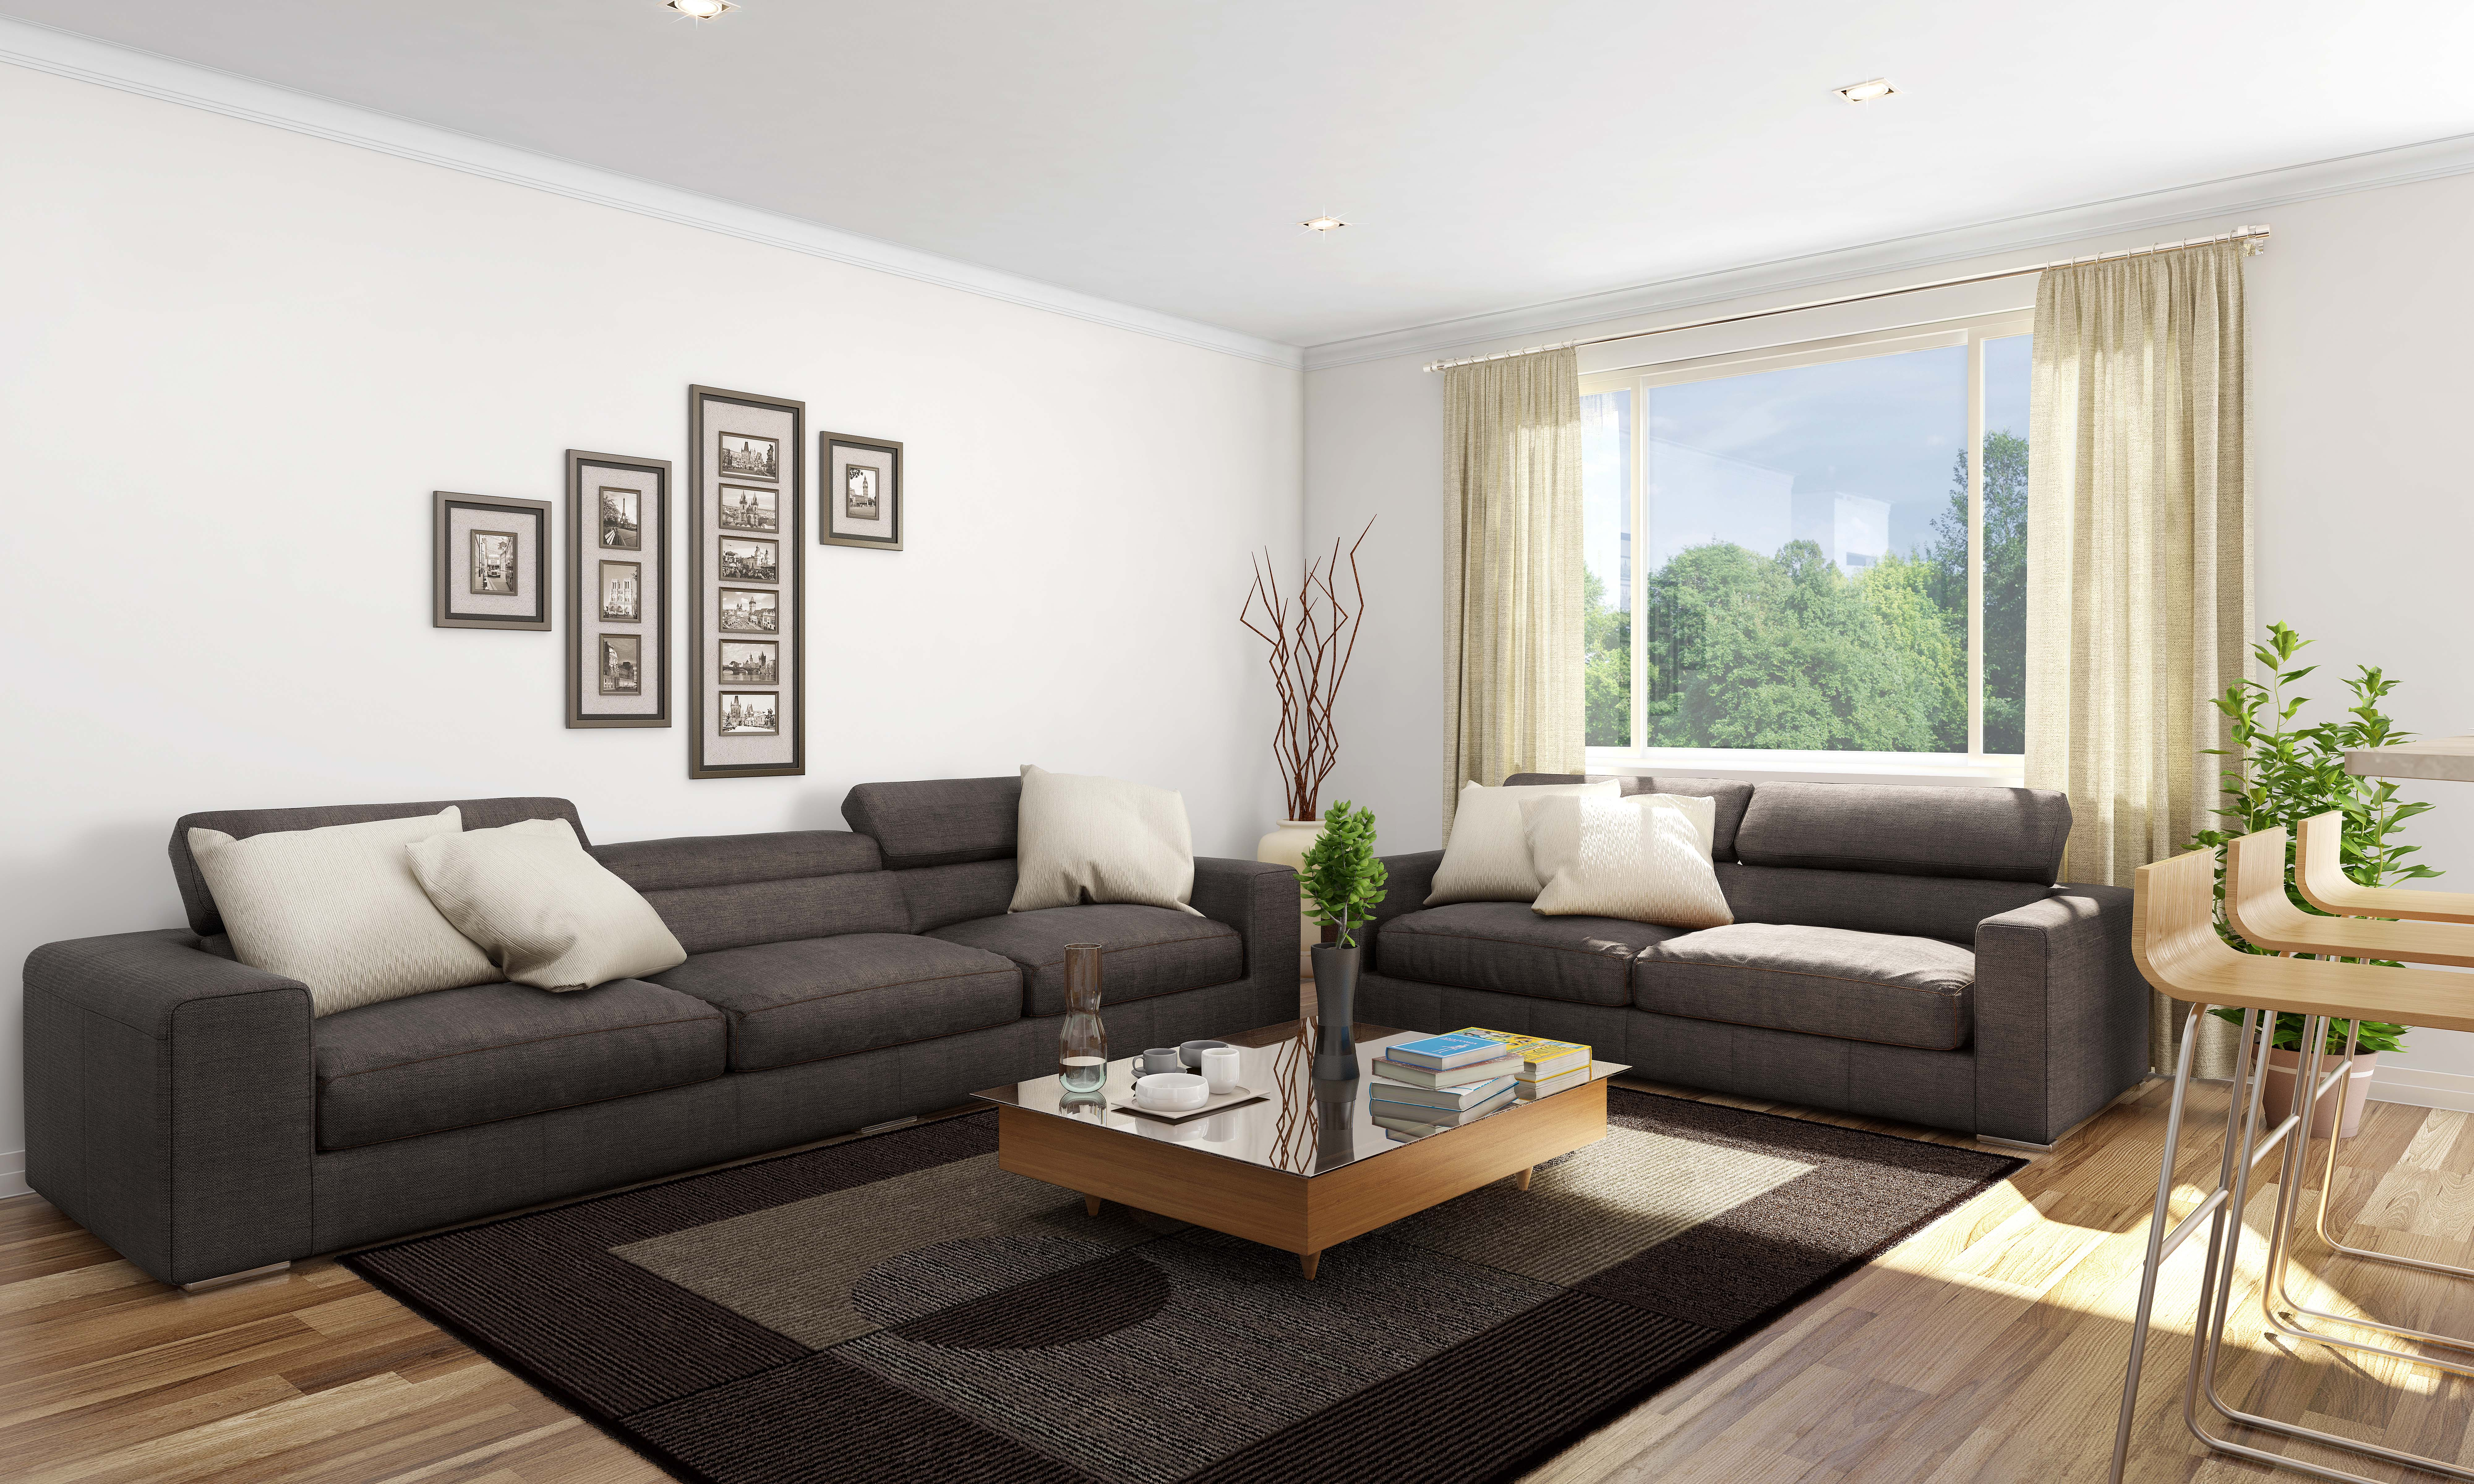 Interior Sample 3